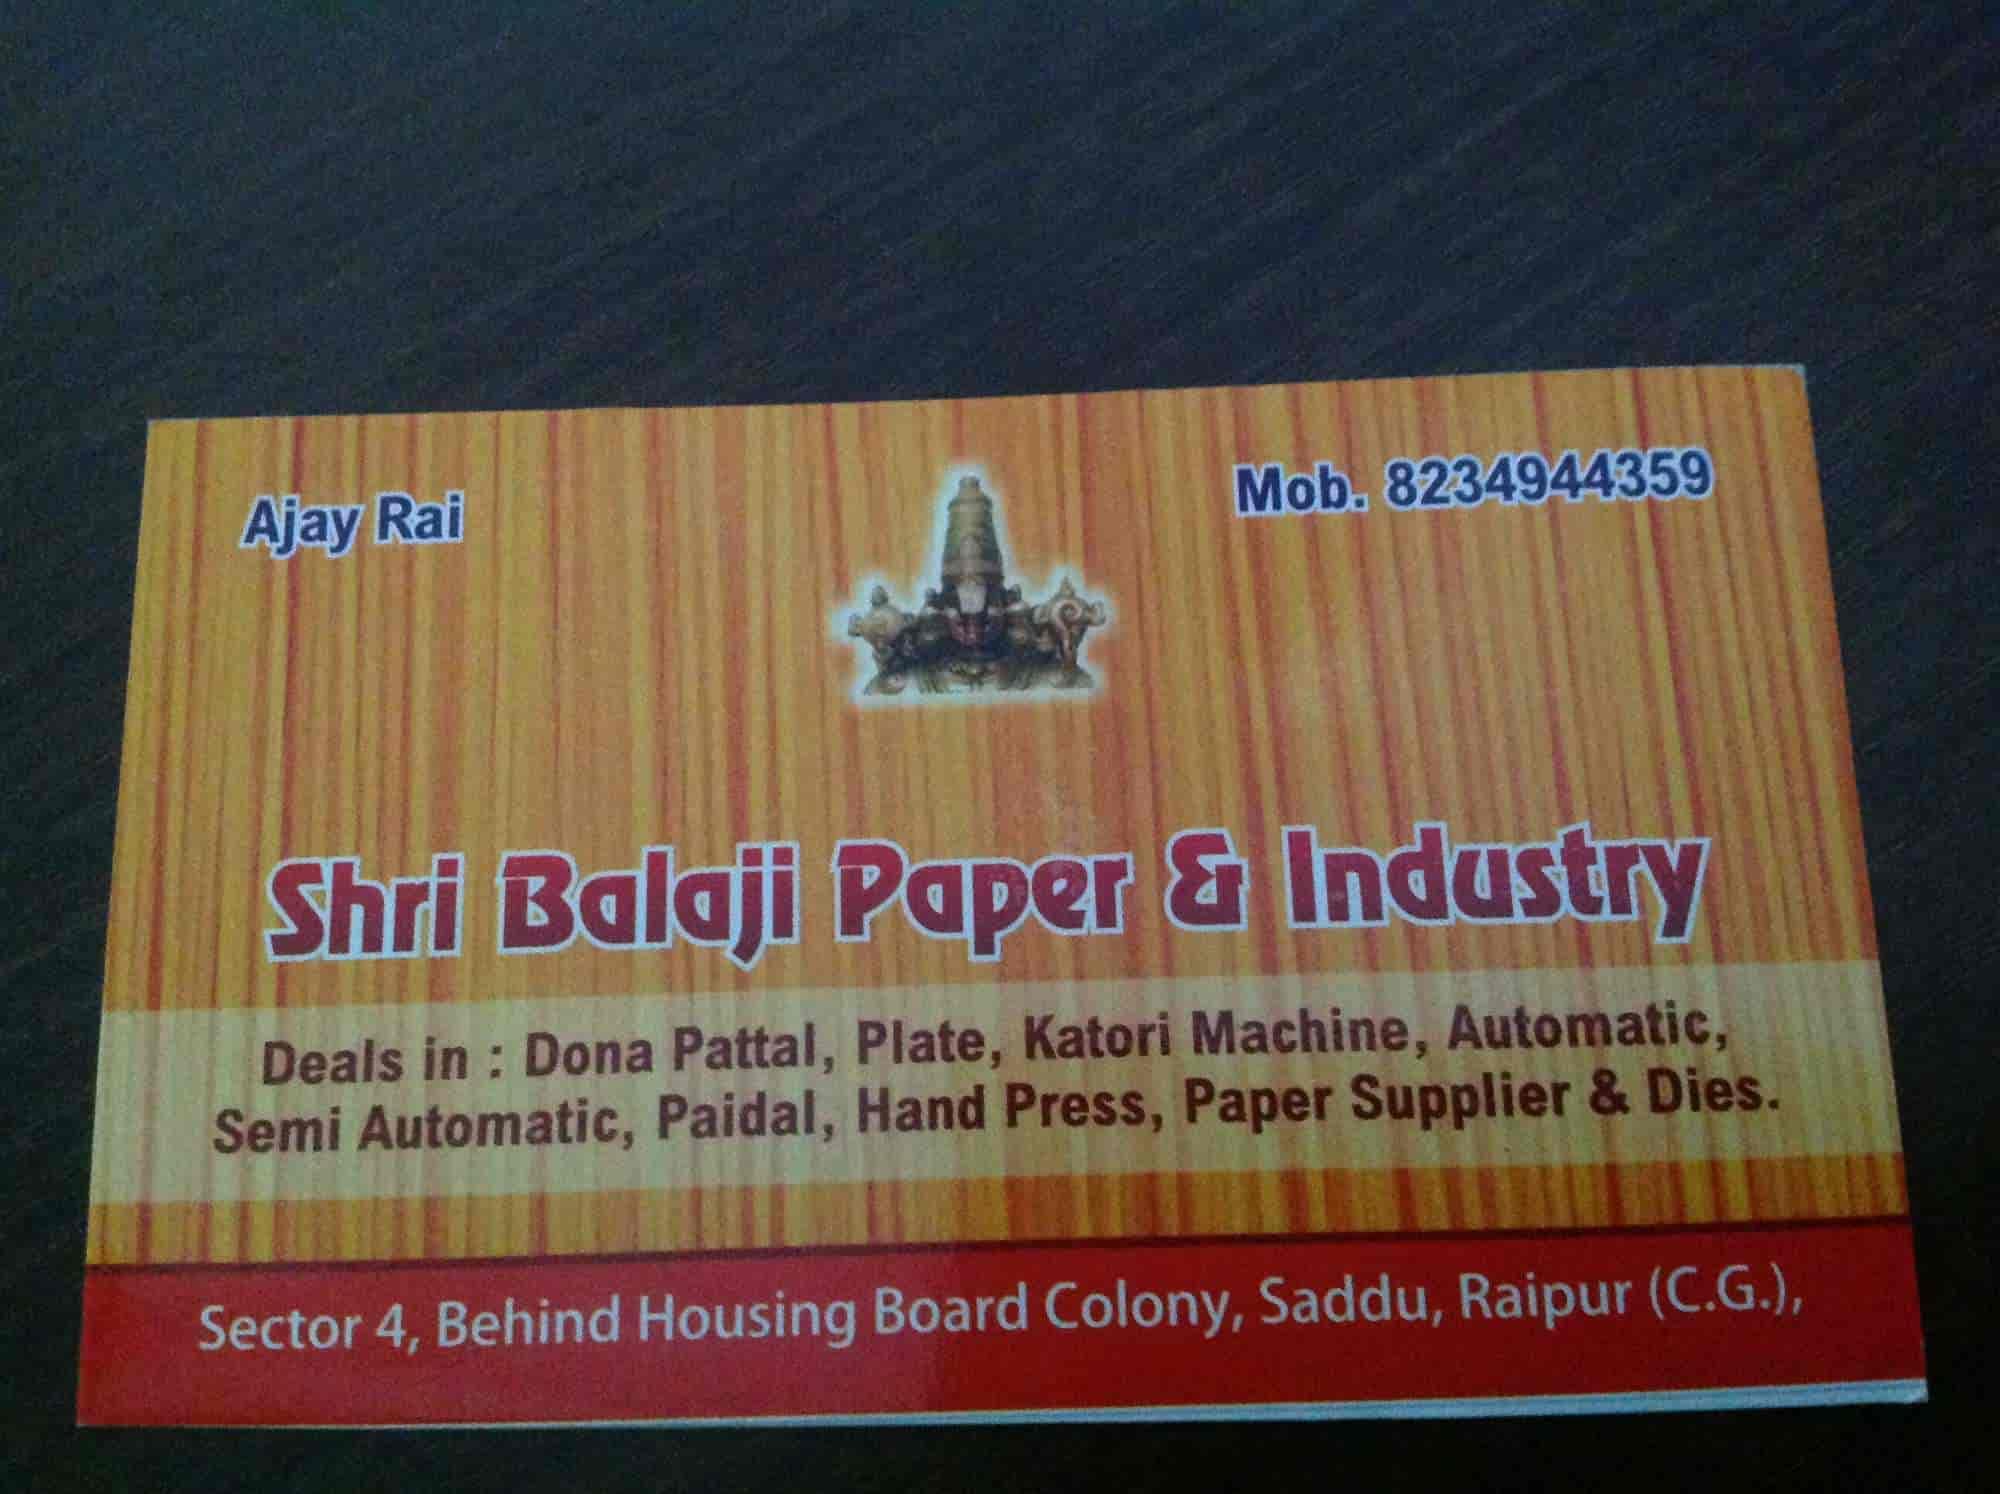 ... Shri Balaji Paper u0026 Industry Photos Saddu raipur-chhattisgarh - Paper Plate Making ... & Shri Balaji Paper Industry Photos Saddu Raipur-Chhattisgarh ...